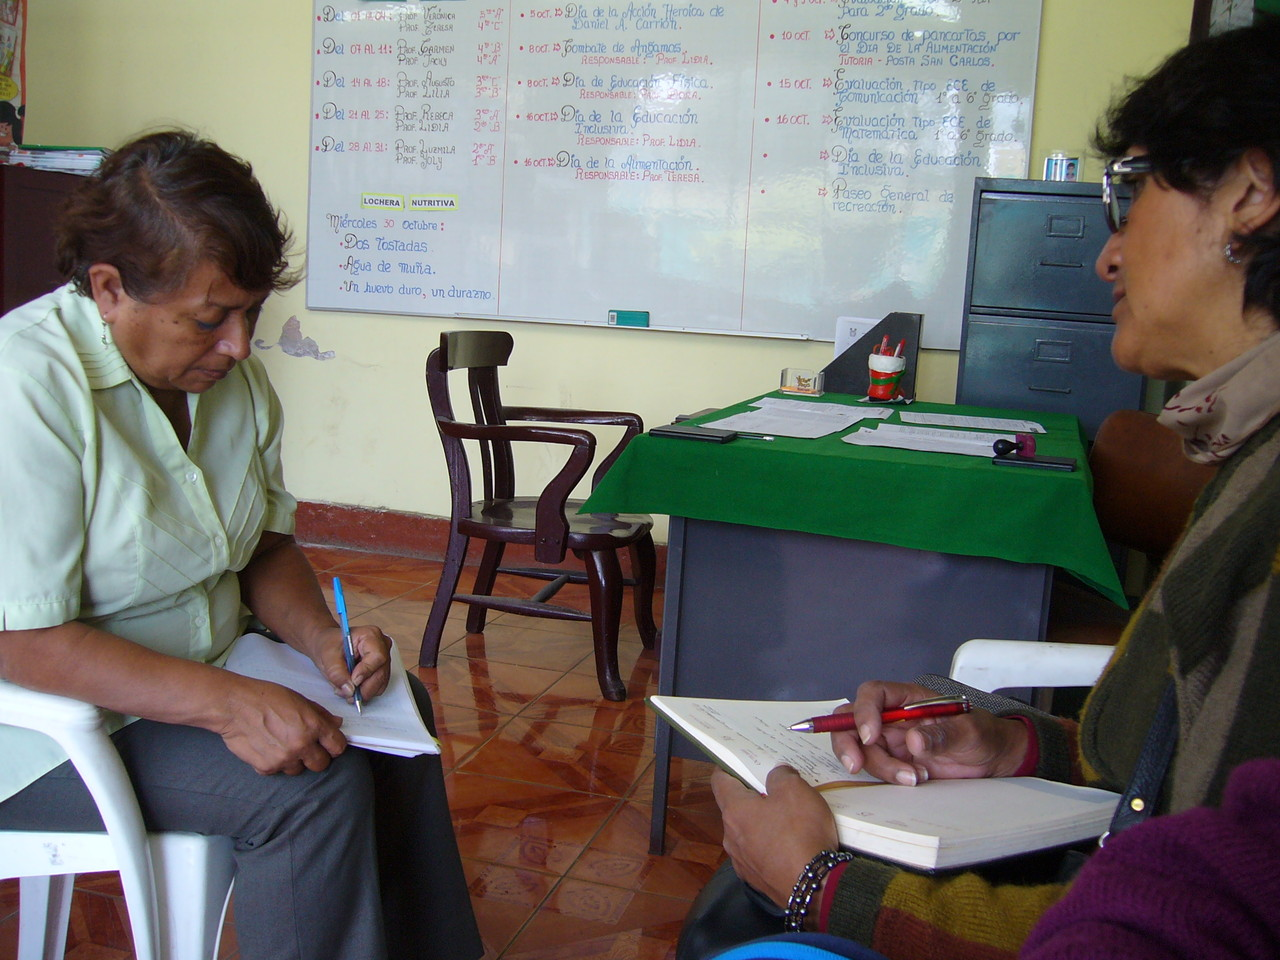 Coordination avec la professeur Emma Huamán